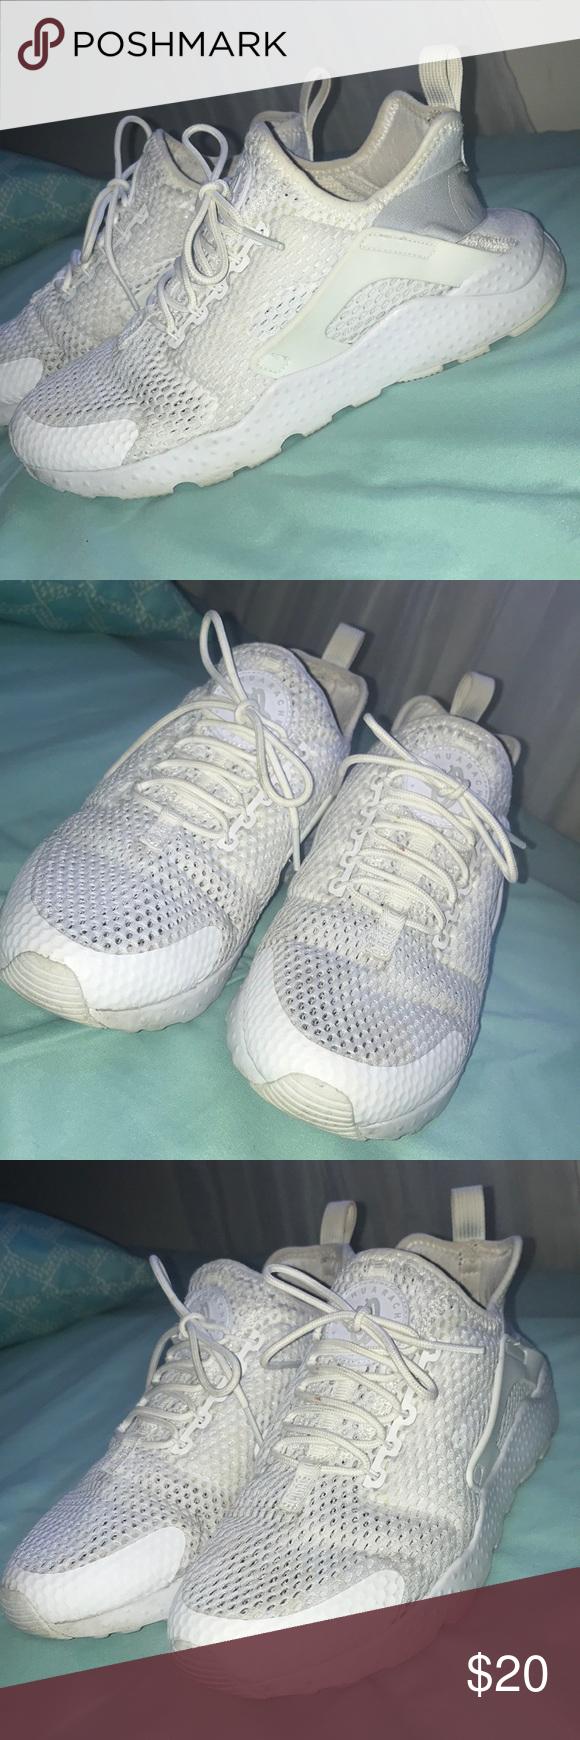 white Nike Huarache run size 7.5 women